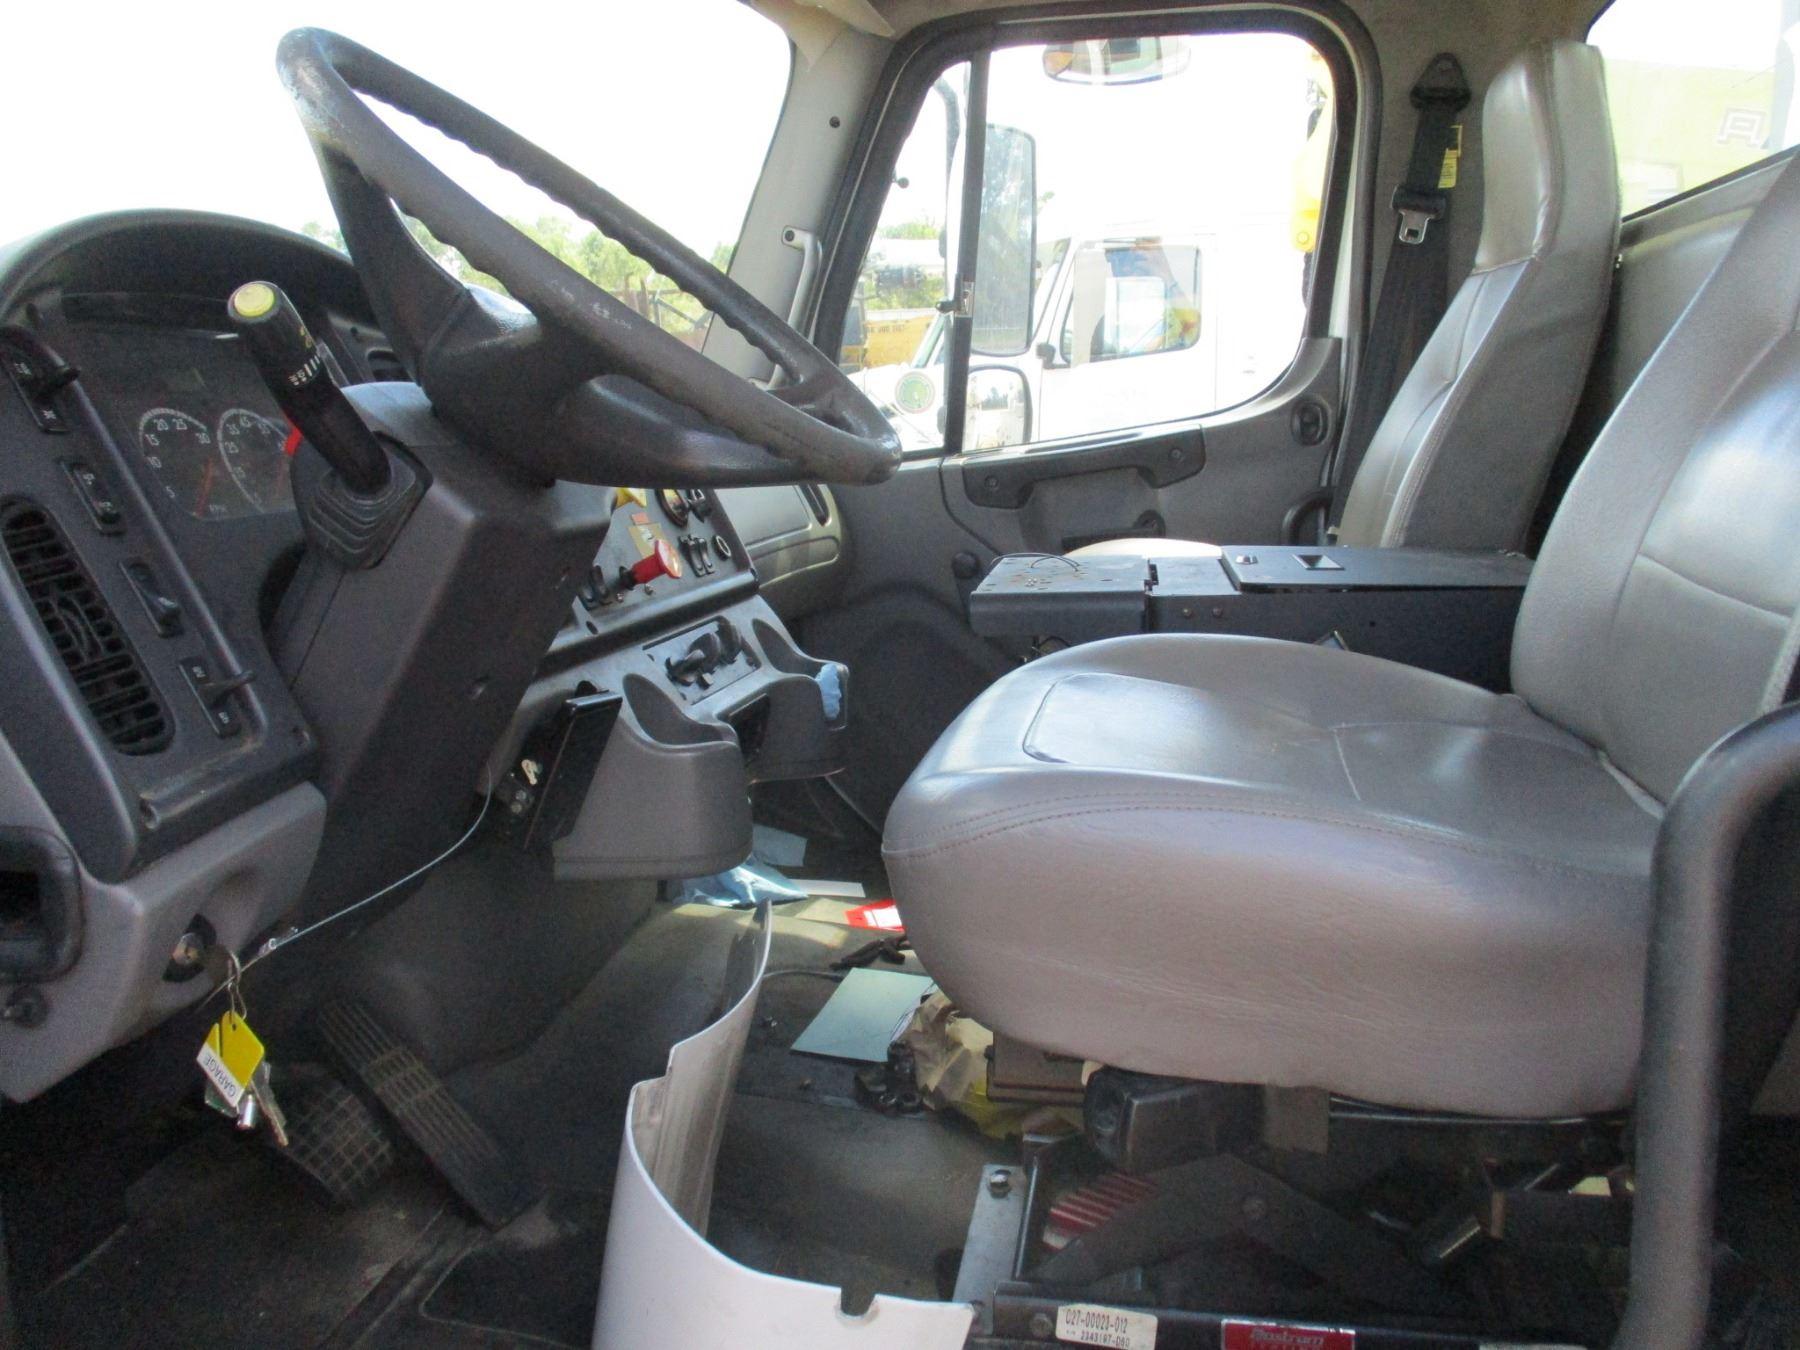 2005 FREIGHTLINER M2 BUCKET TRUCK, VIN/SN:1FVACYDCX5HY58224 - CAT DIESEL  ENGINE, A/T, ALTEC SERVICE